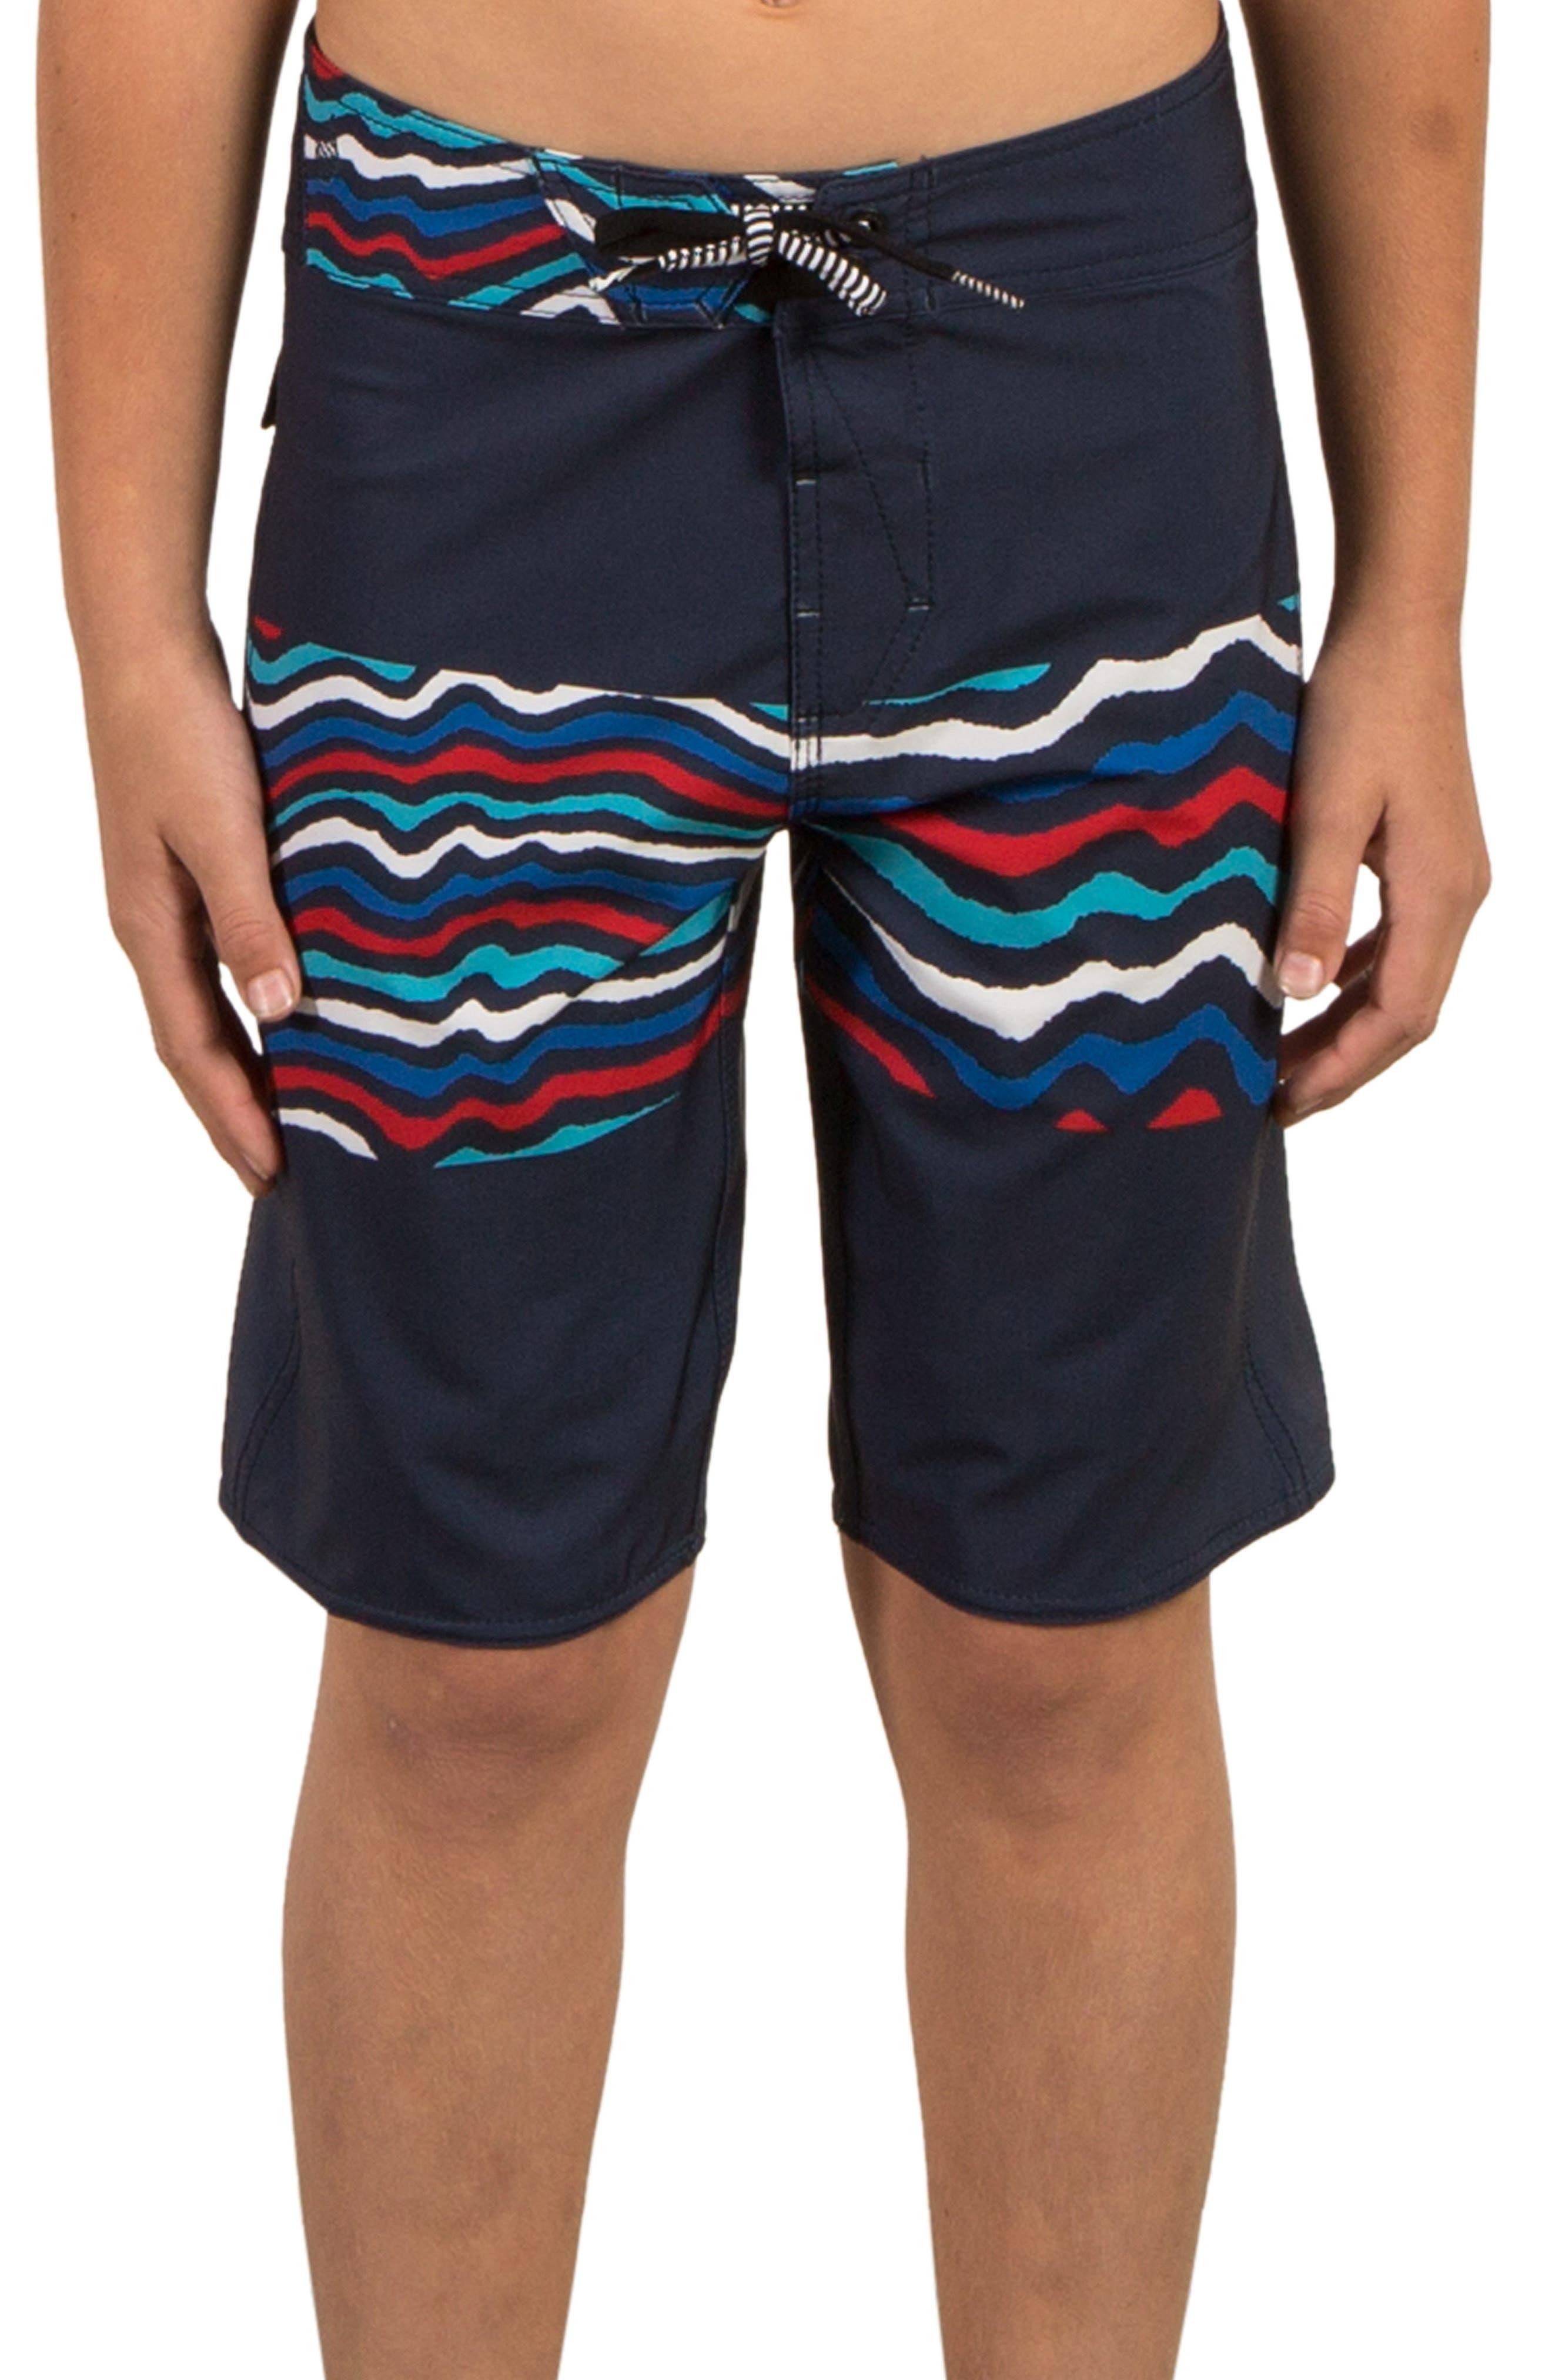 Alternate Image 1 Selected - Volcom Macaw Mod Board Shorts (Big Boys)